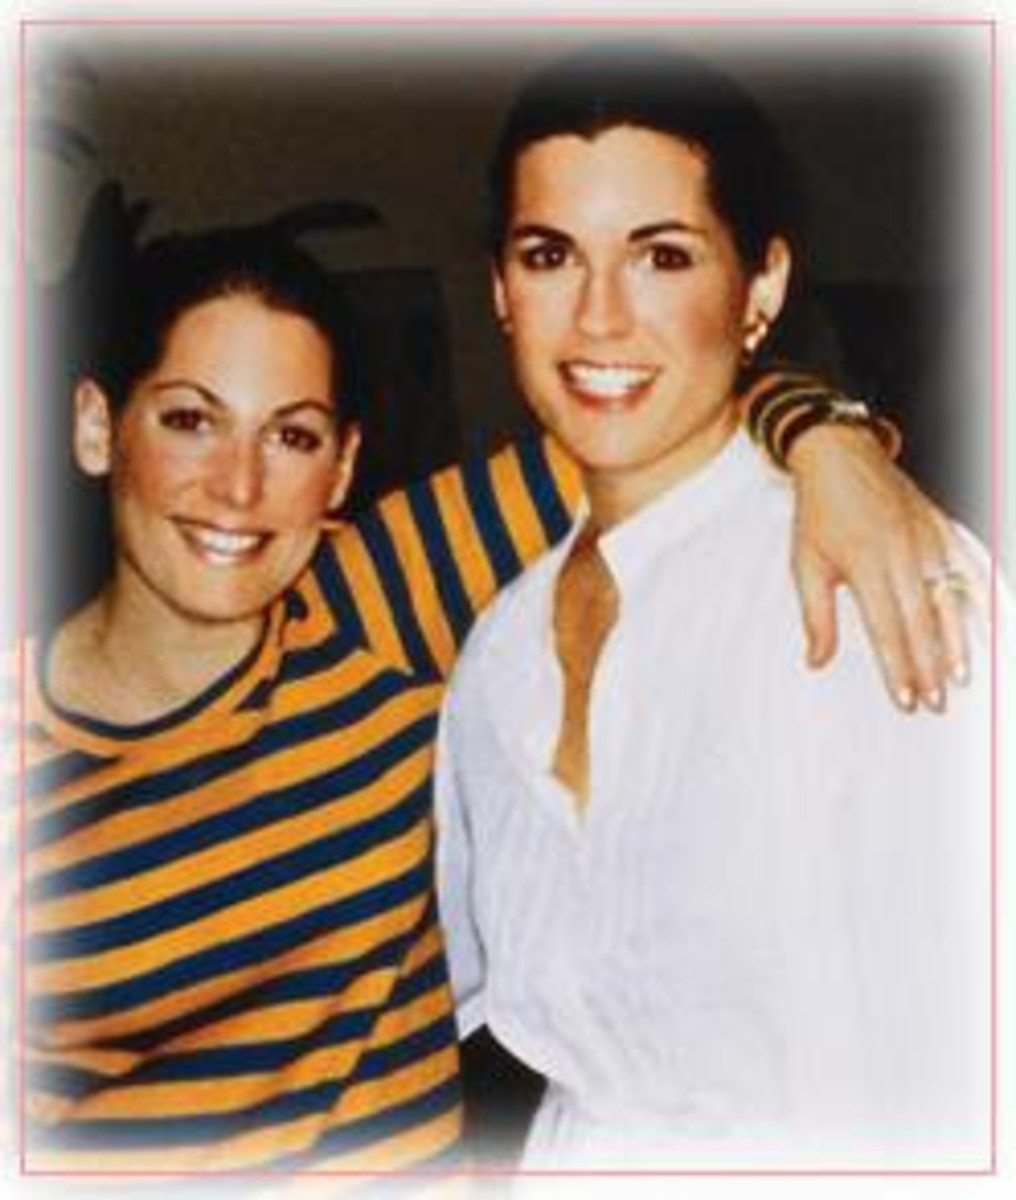 Susan G. Komen and Nancy Brinker